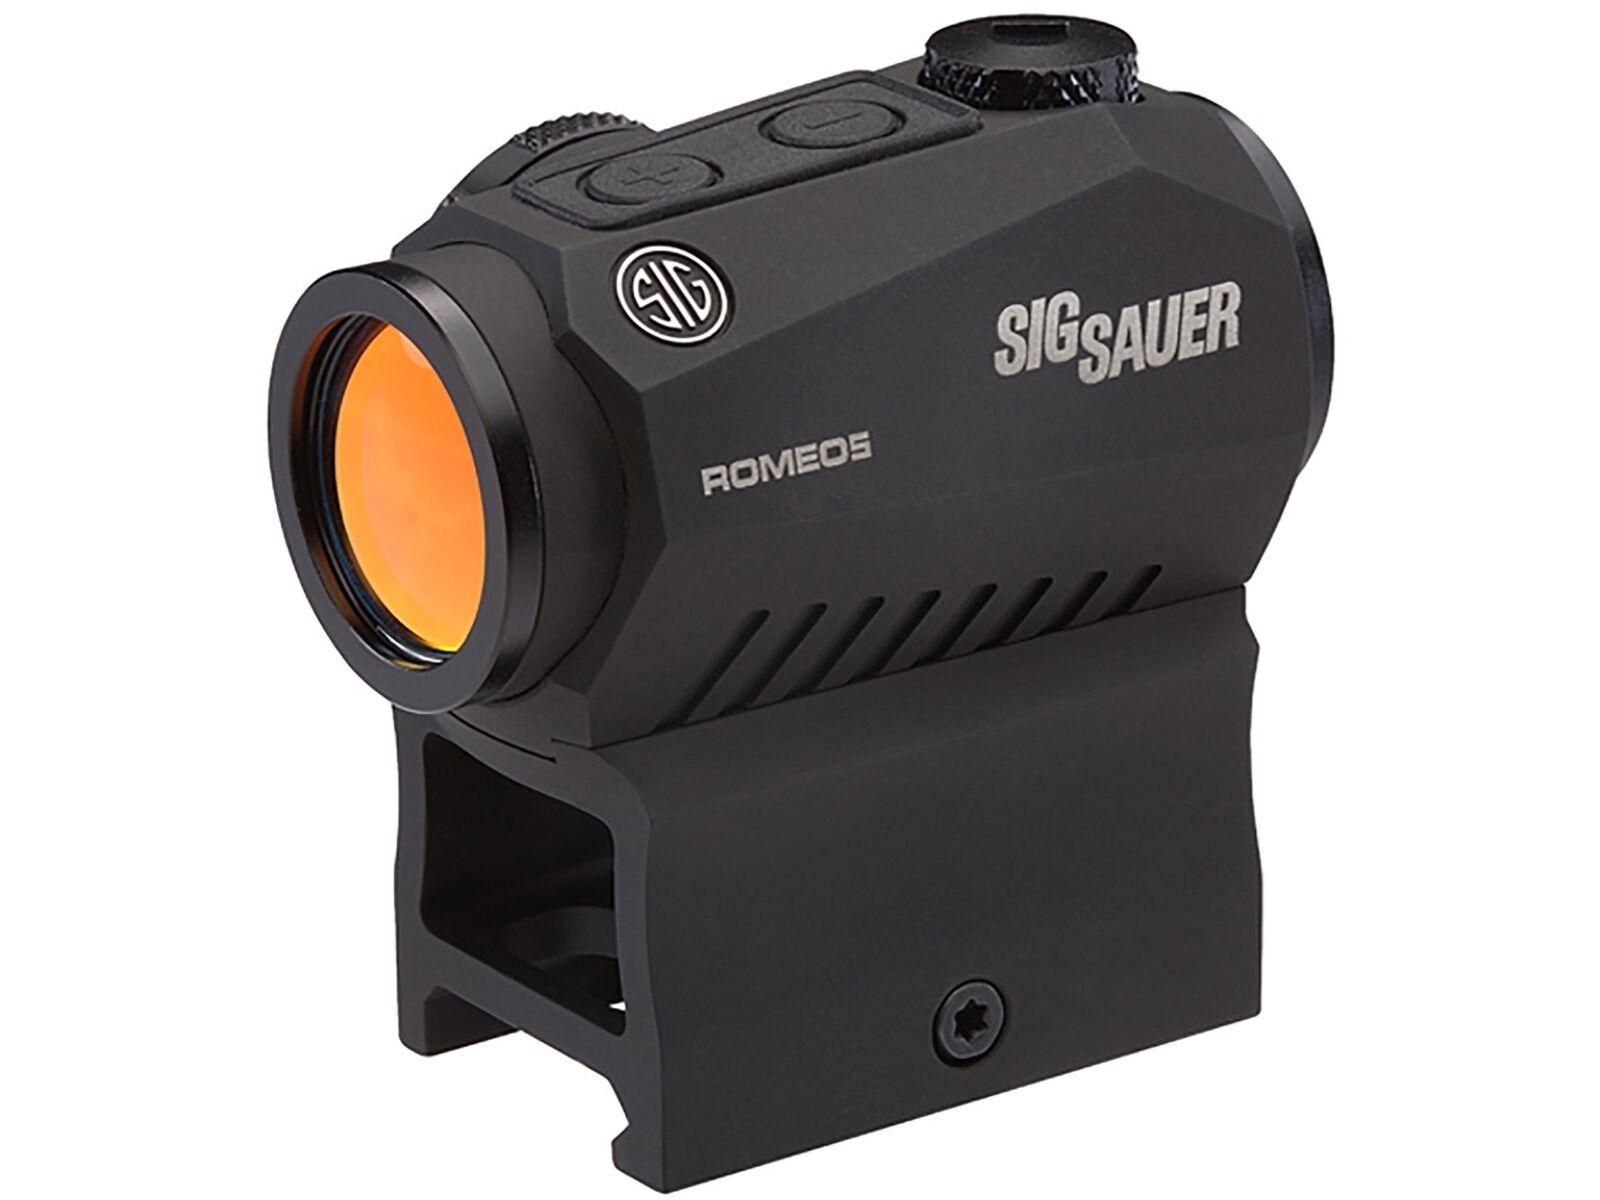 SIG Sauer ROMEO5 rot Dot Sight Rifle Scope 2 MOA Dot Retticle SOR52001